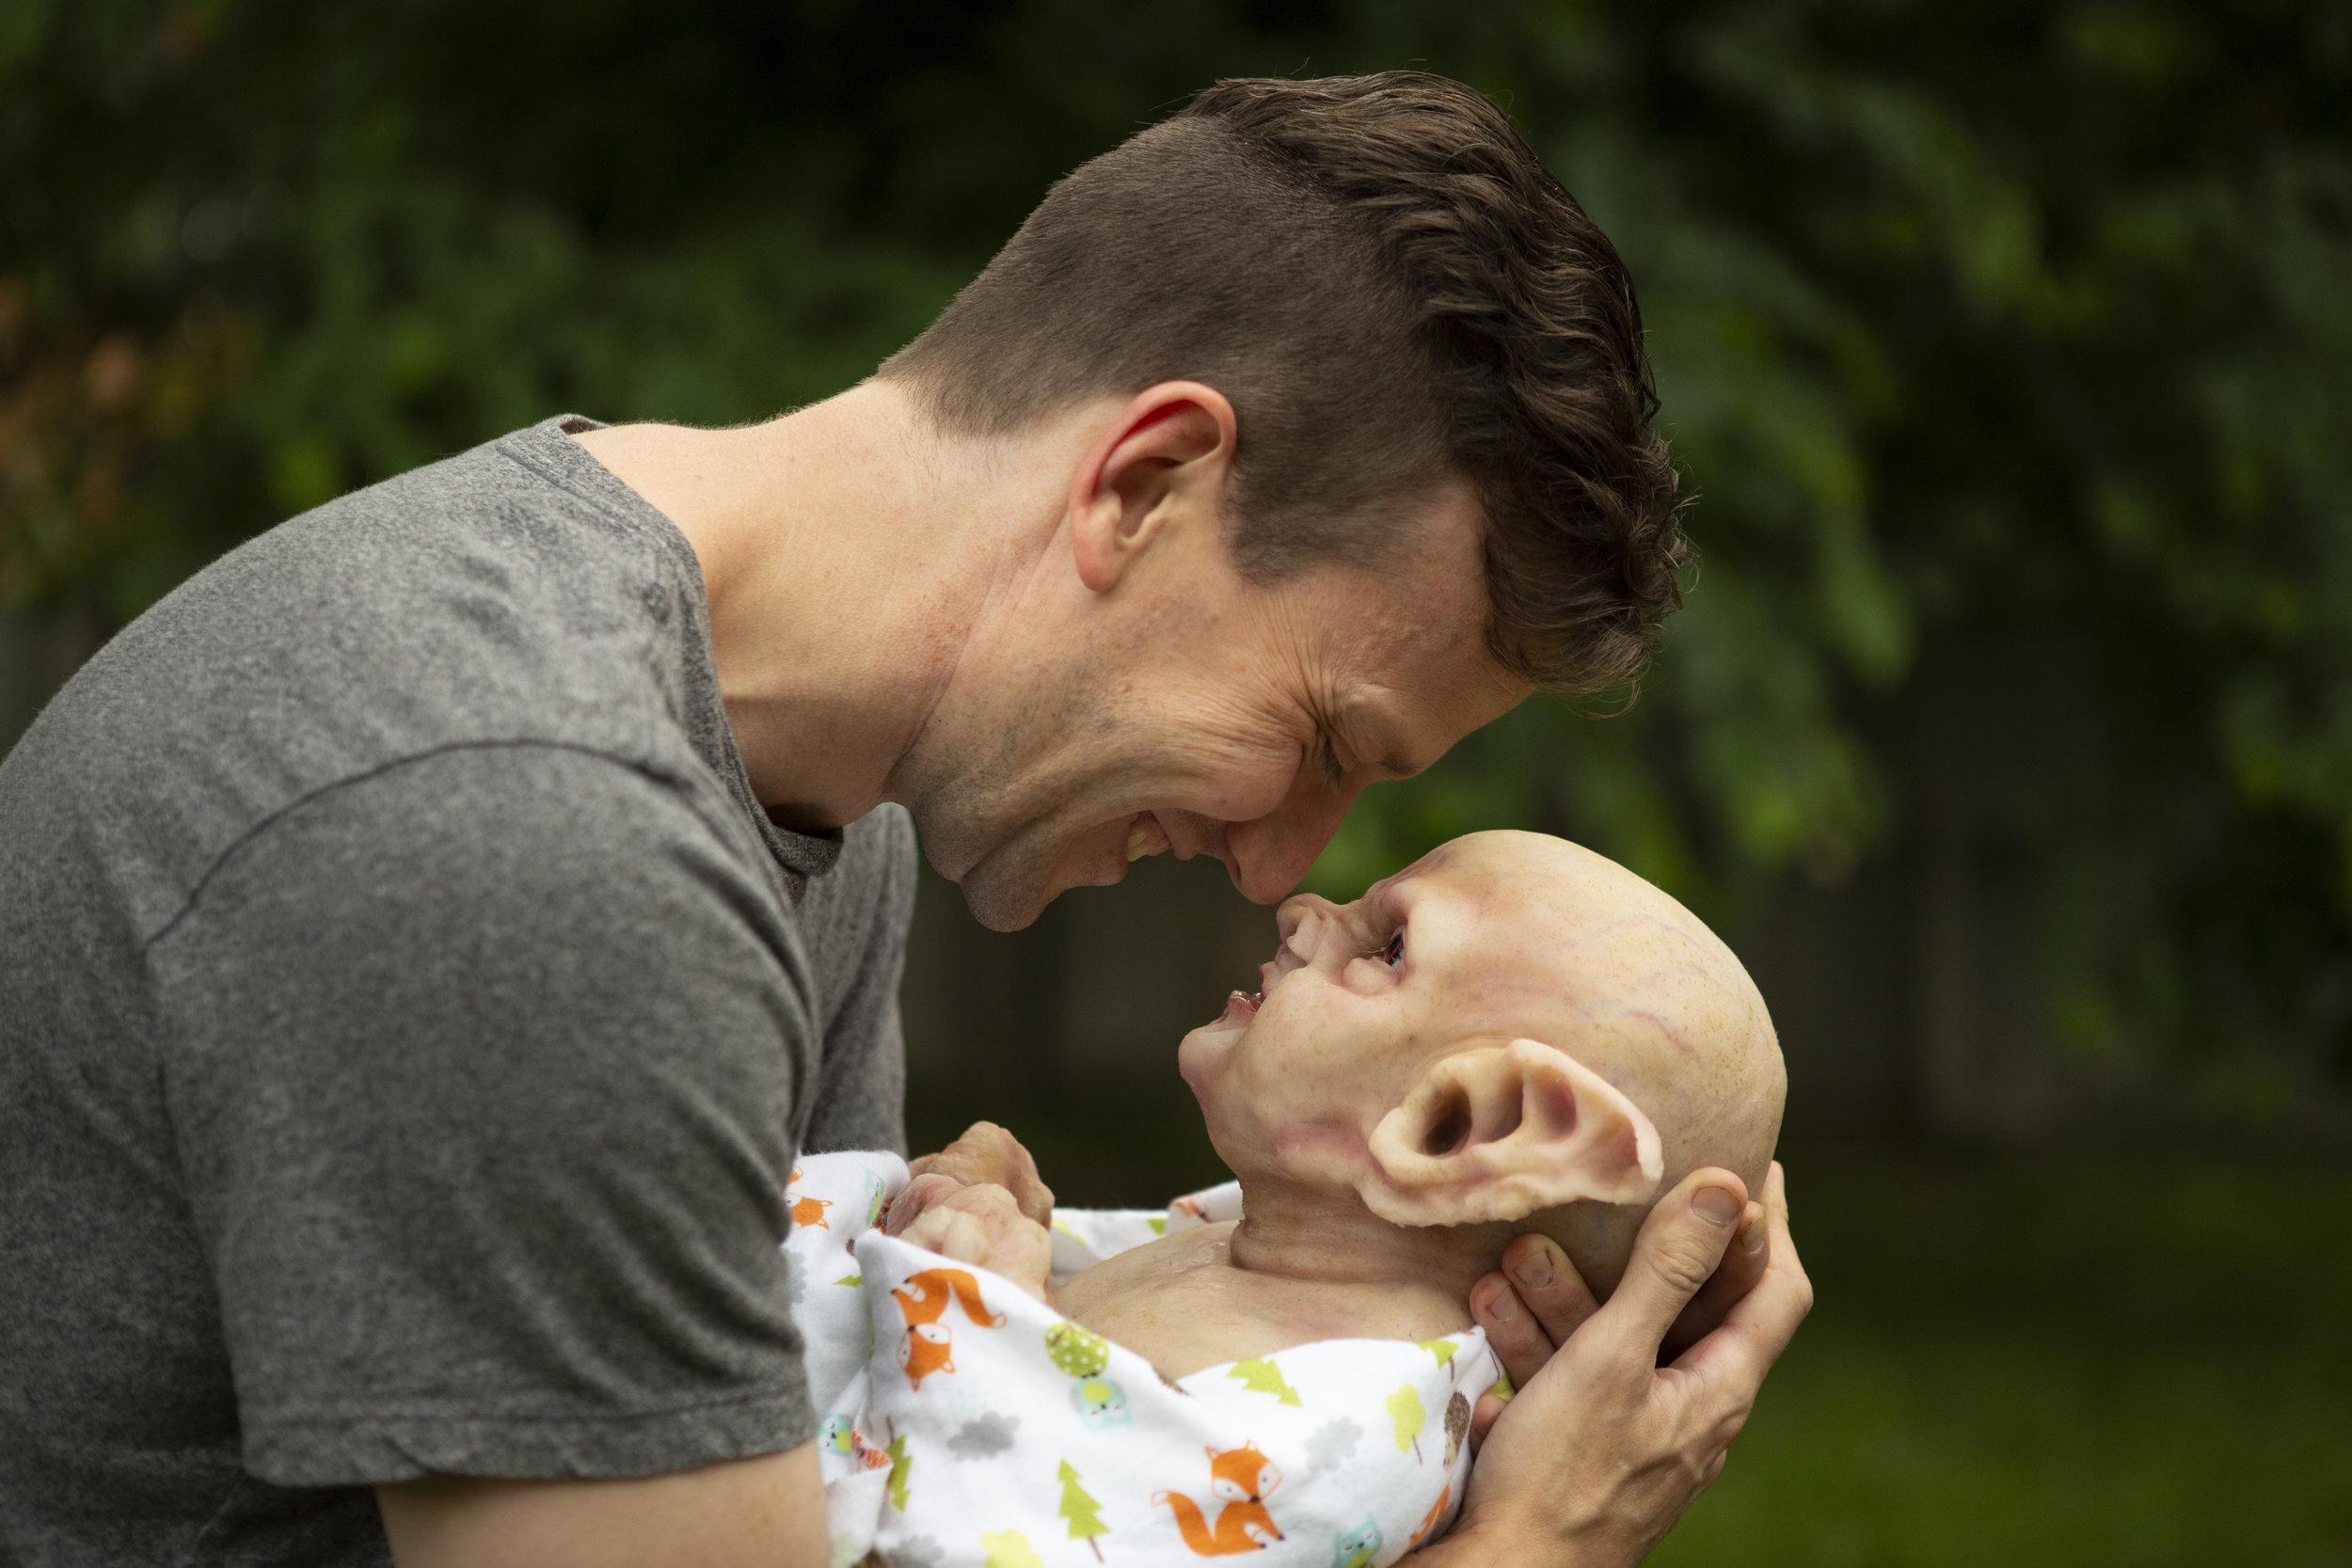 Dad & Newborn Vampire  | Newborn photoshoot | Ravendark Creations Vampire Baby | Newborn Photoshoots | Alyssia Booth's Candid & Studio | www.abcandidstudio.com